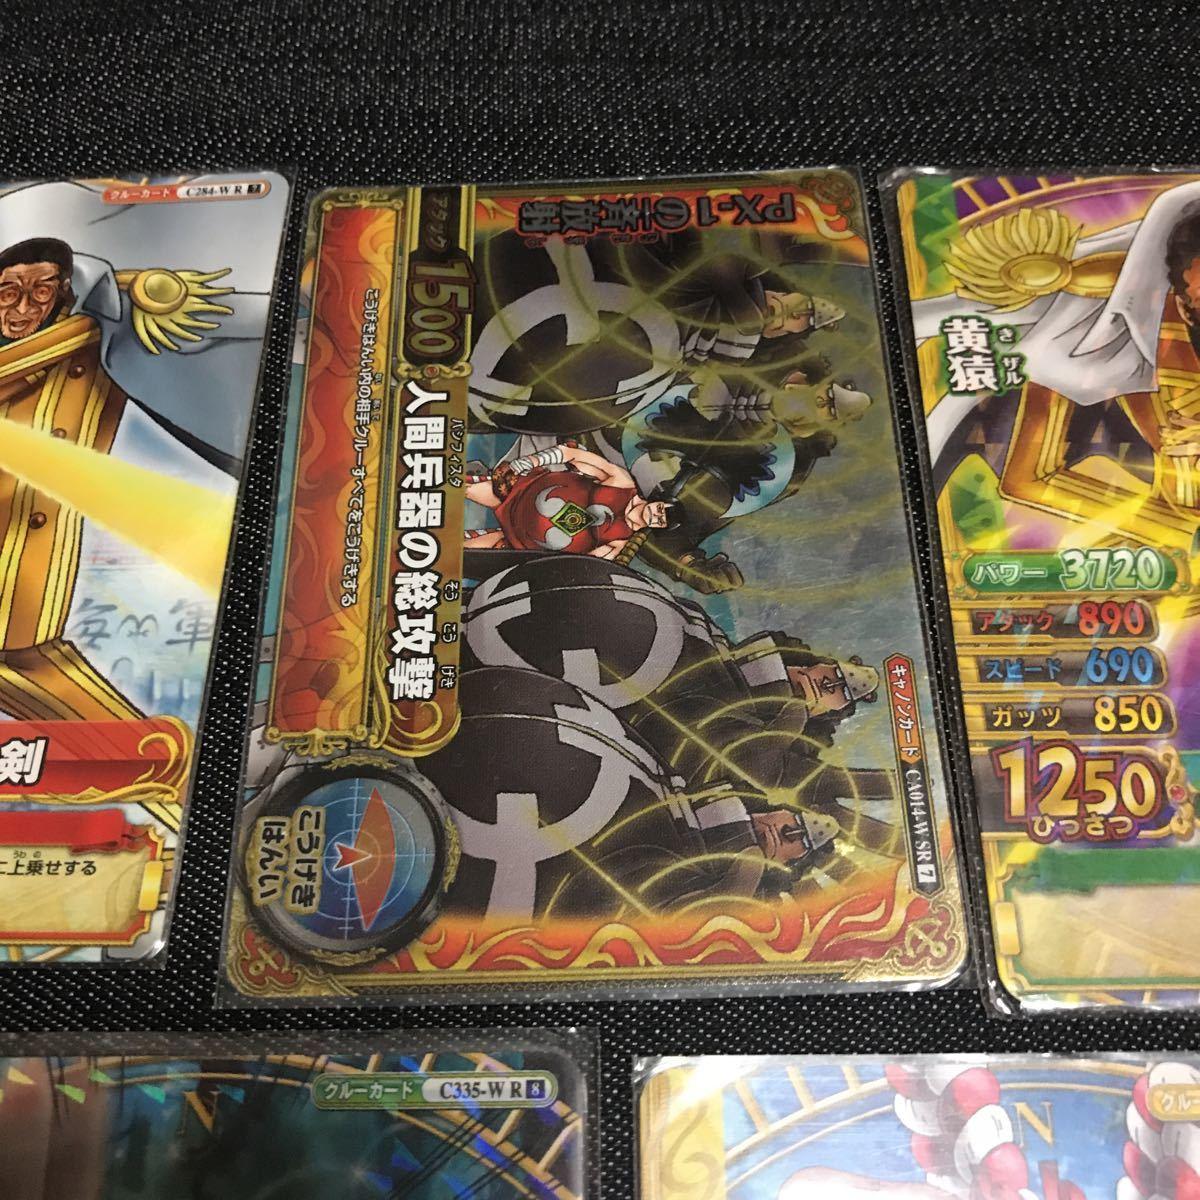 【ONE PIECE】ワンピーベリーマッチダブル 黄猿 ボルサリーノ & 戦桃丸 セット_画像3